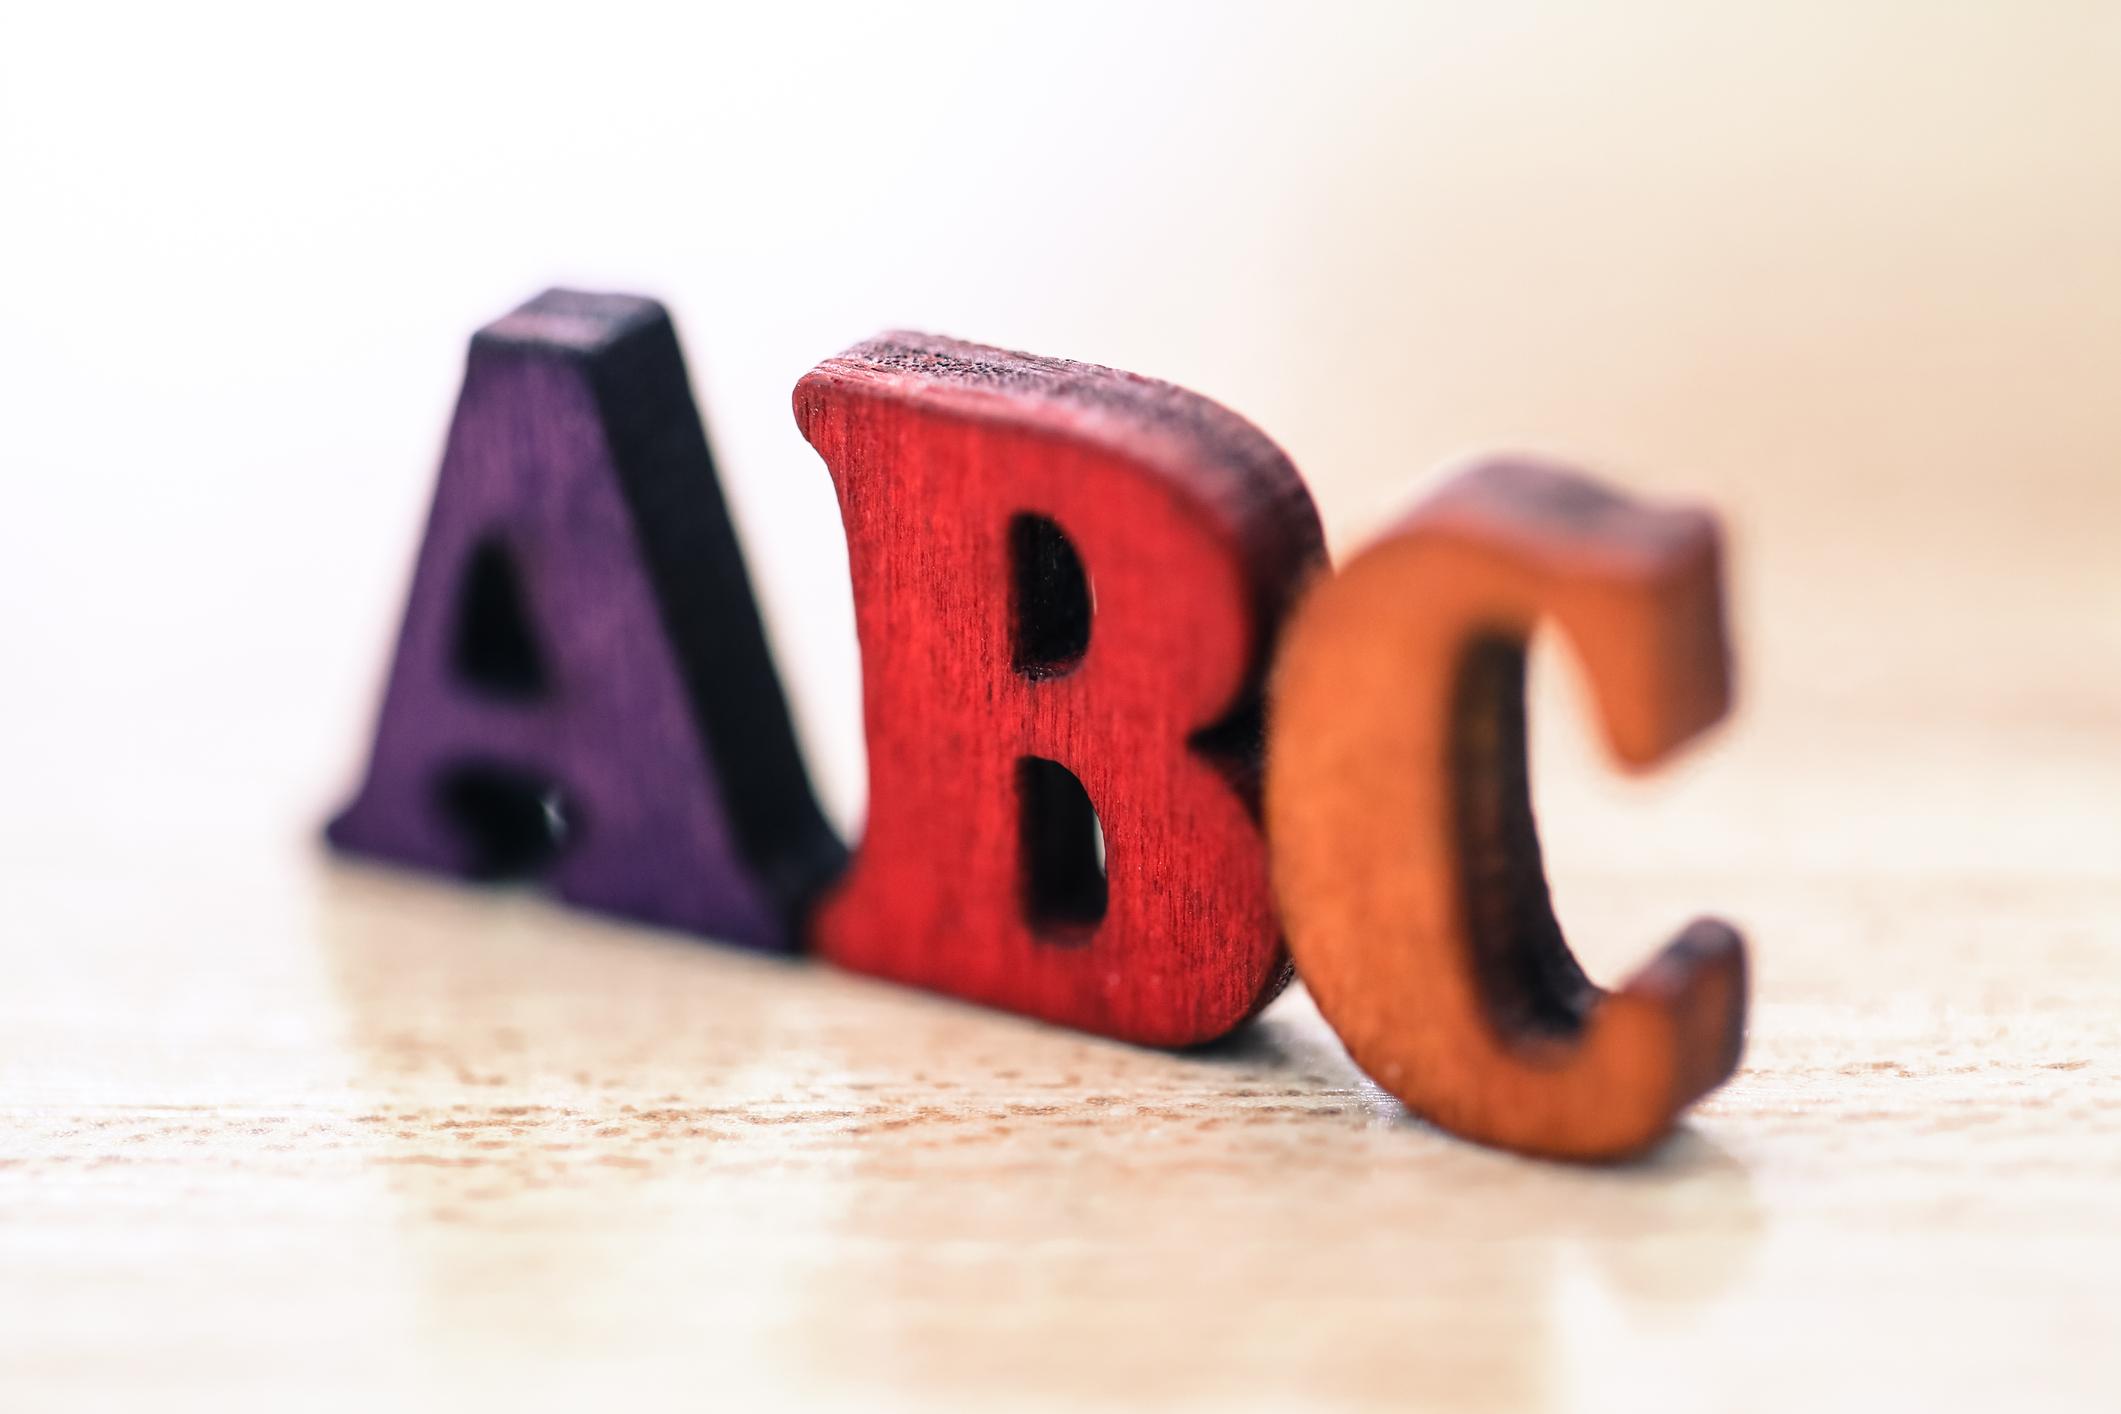 ABC's of Authenticity - Authority, Balance, and Creativity